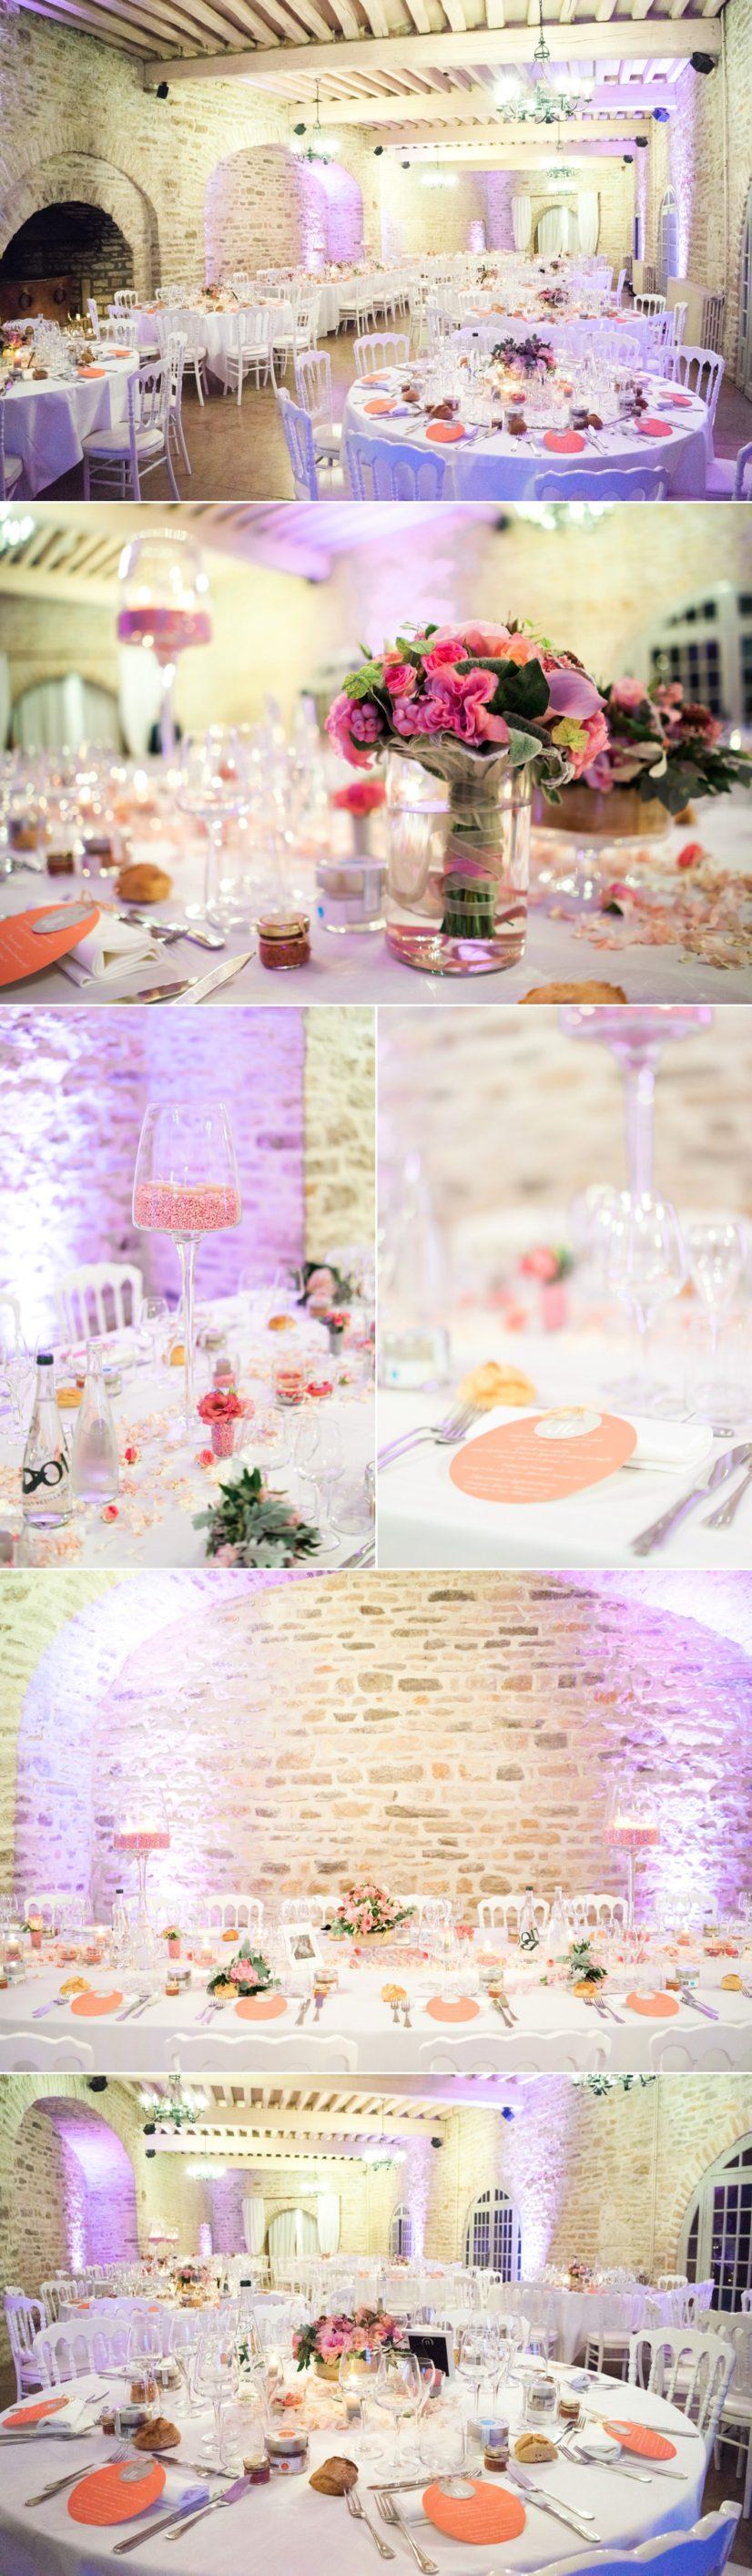 photographe mariage chateau de Santenay deco table